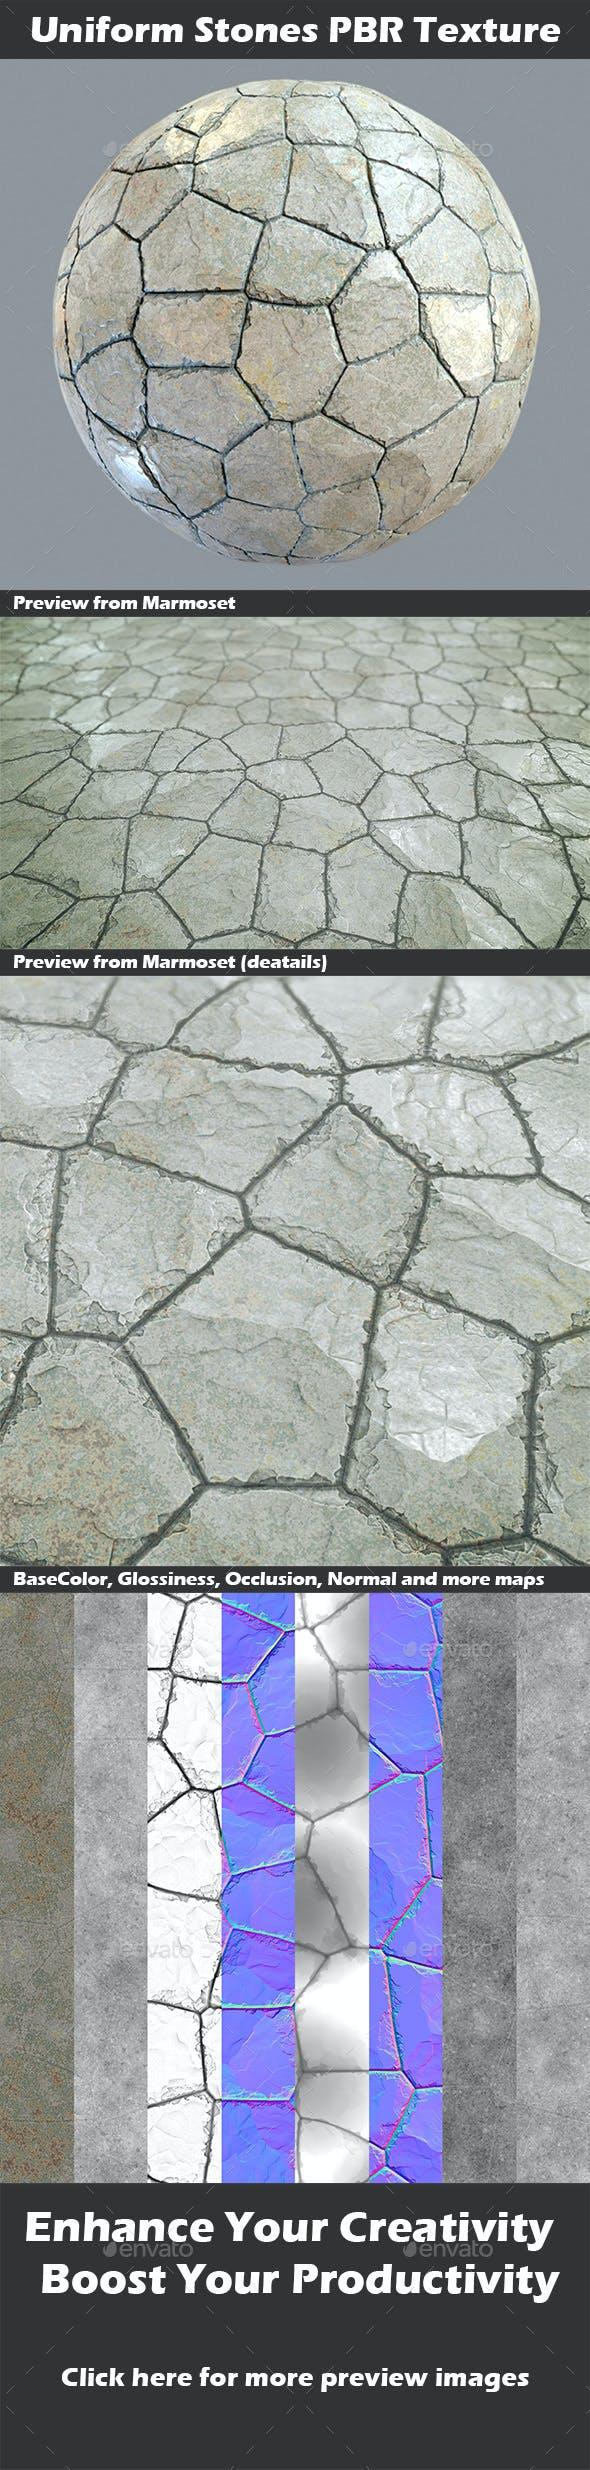 Uniform Stones v2 PBR Texture - 3DOcean Item for Sale